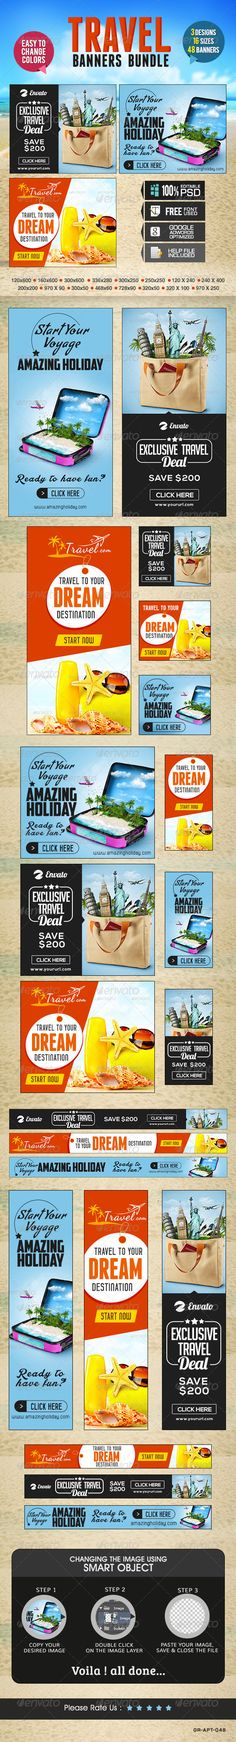 Travel Banner Set Bundle - 3 Sets Template PSD | Buy and Download: http://graphicriver.net/item/travel-banner-set-bundle-3-sets/8469231?WT.ac=category_thumb&WT.z_author=doto&ref=ksioks